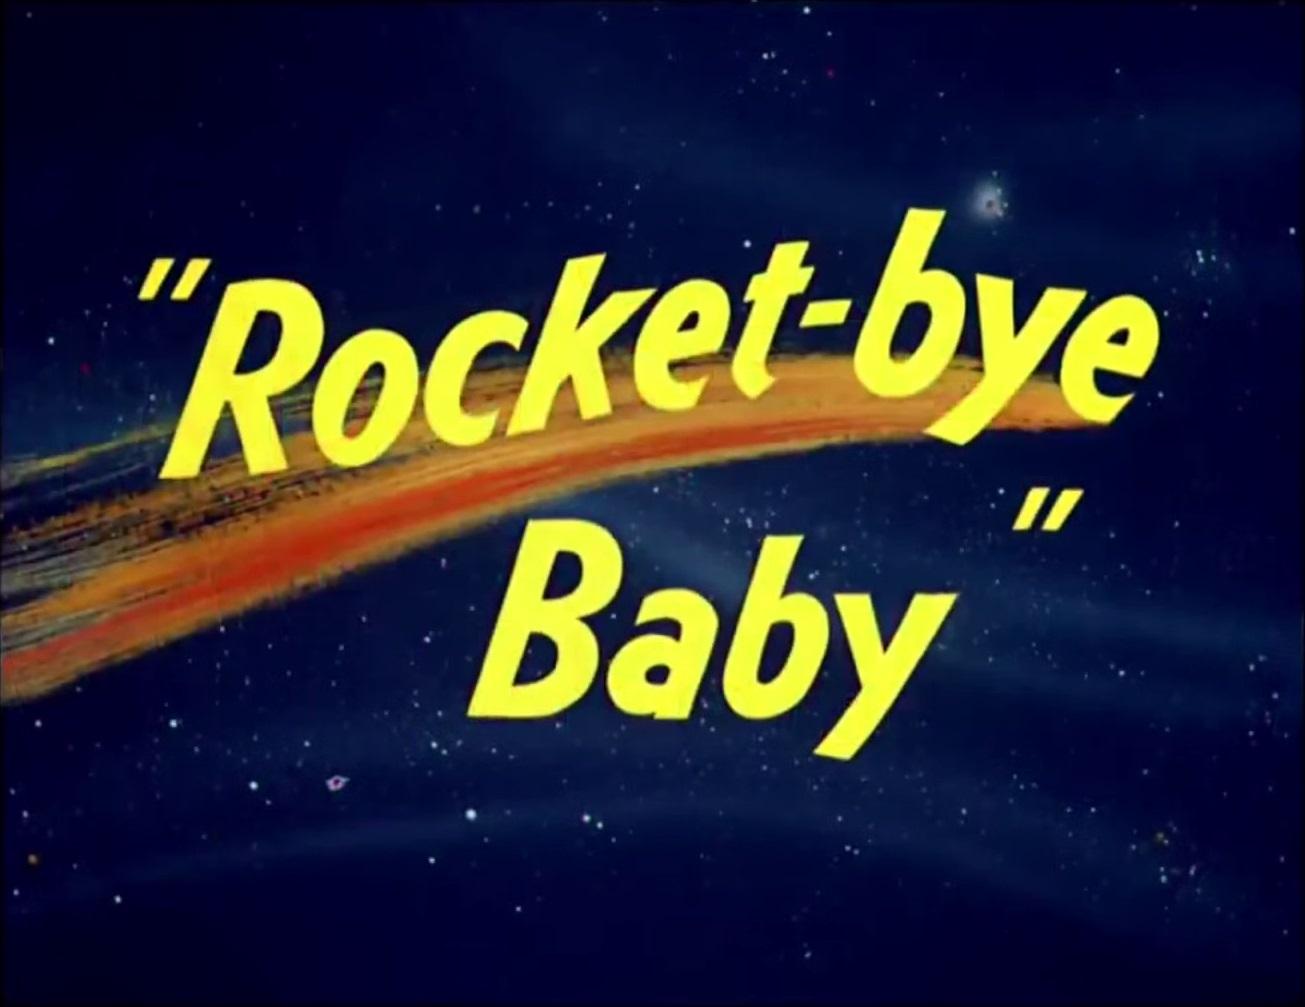 Rocket-bye Baby | Looney Tunes Wiki | FANDOM powered by Wikia